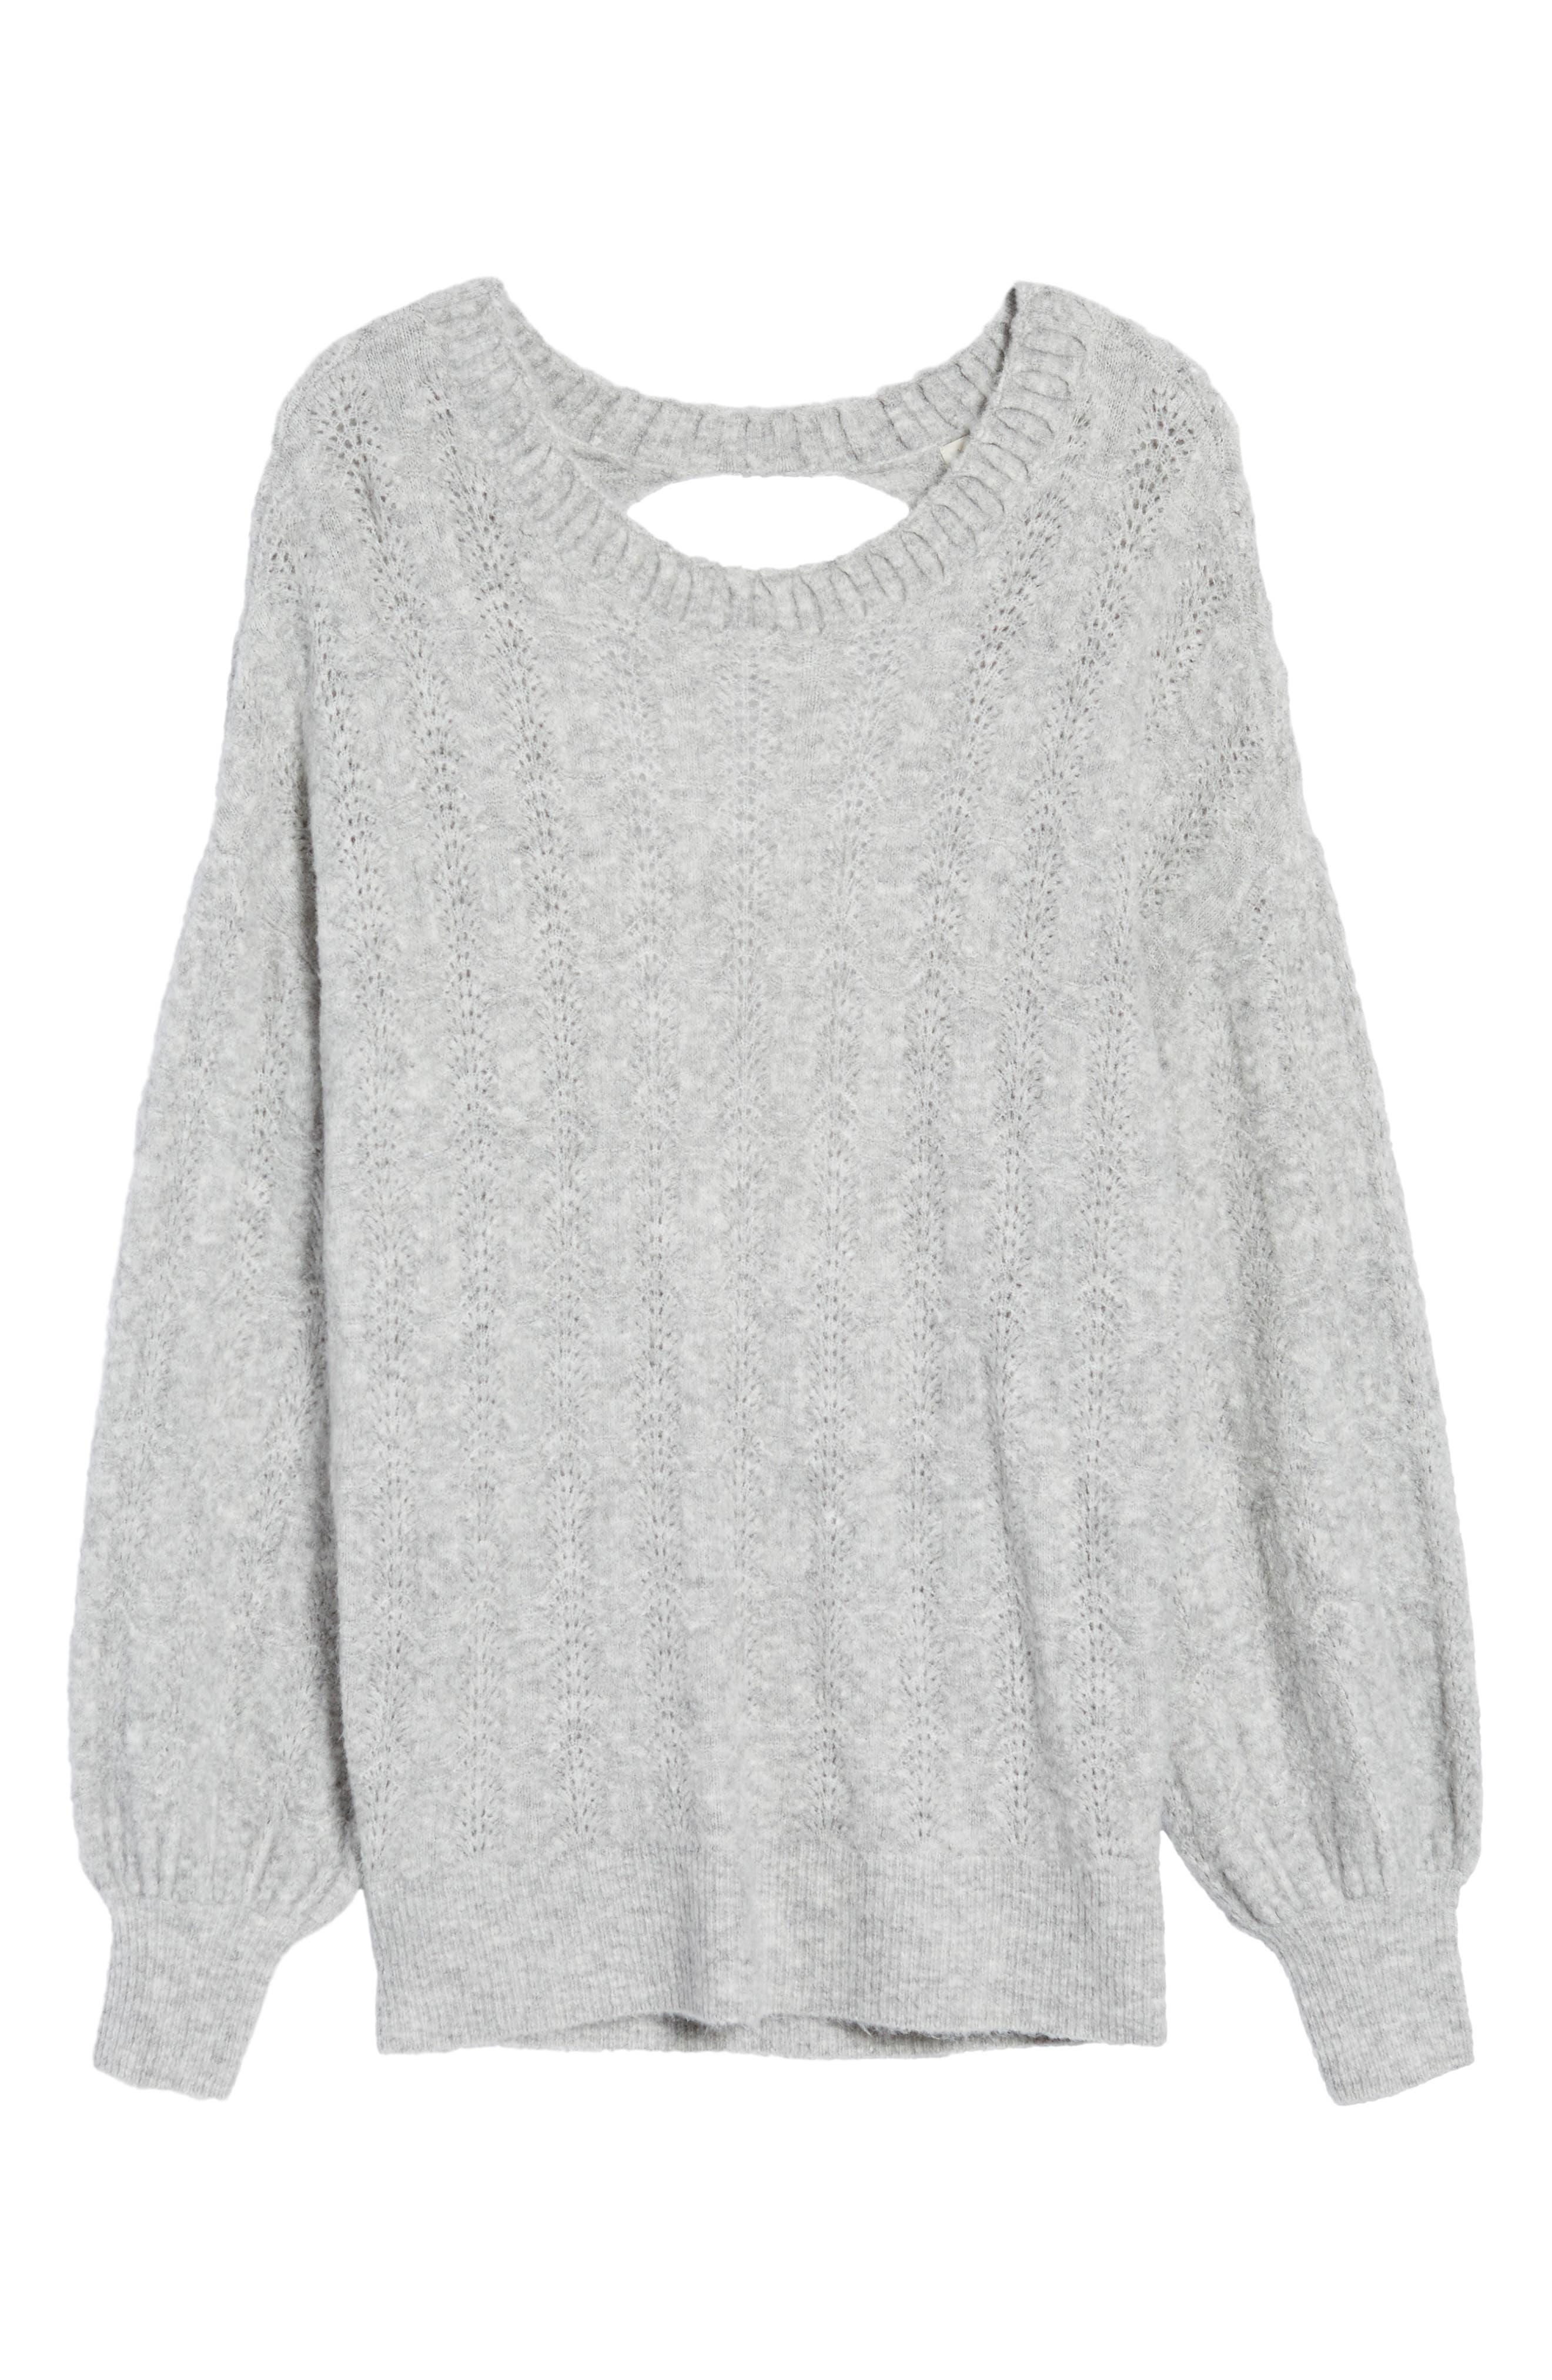 Open Back Sweater,                             Alternate thumbnail 6, color,                             020